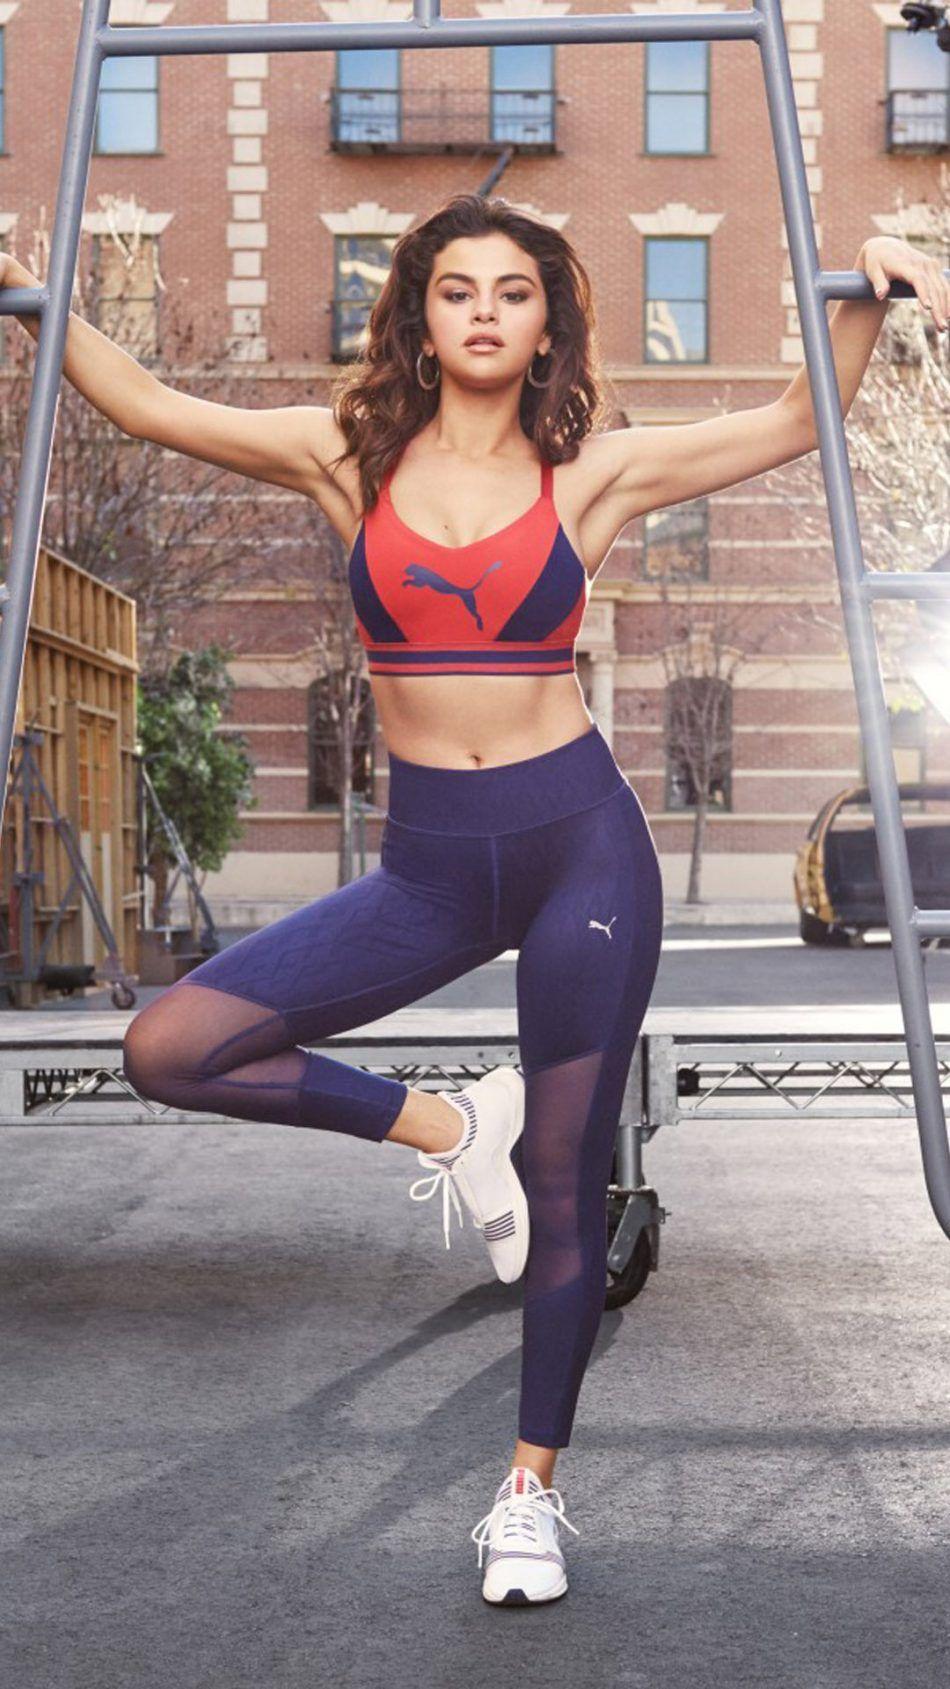 Photo of Selena Gomez Puma 2018 Free 4K Ultra HD Mobile Wallpaper